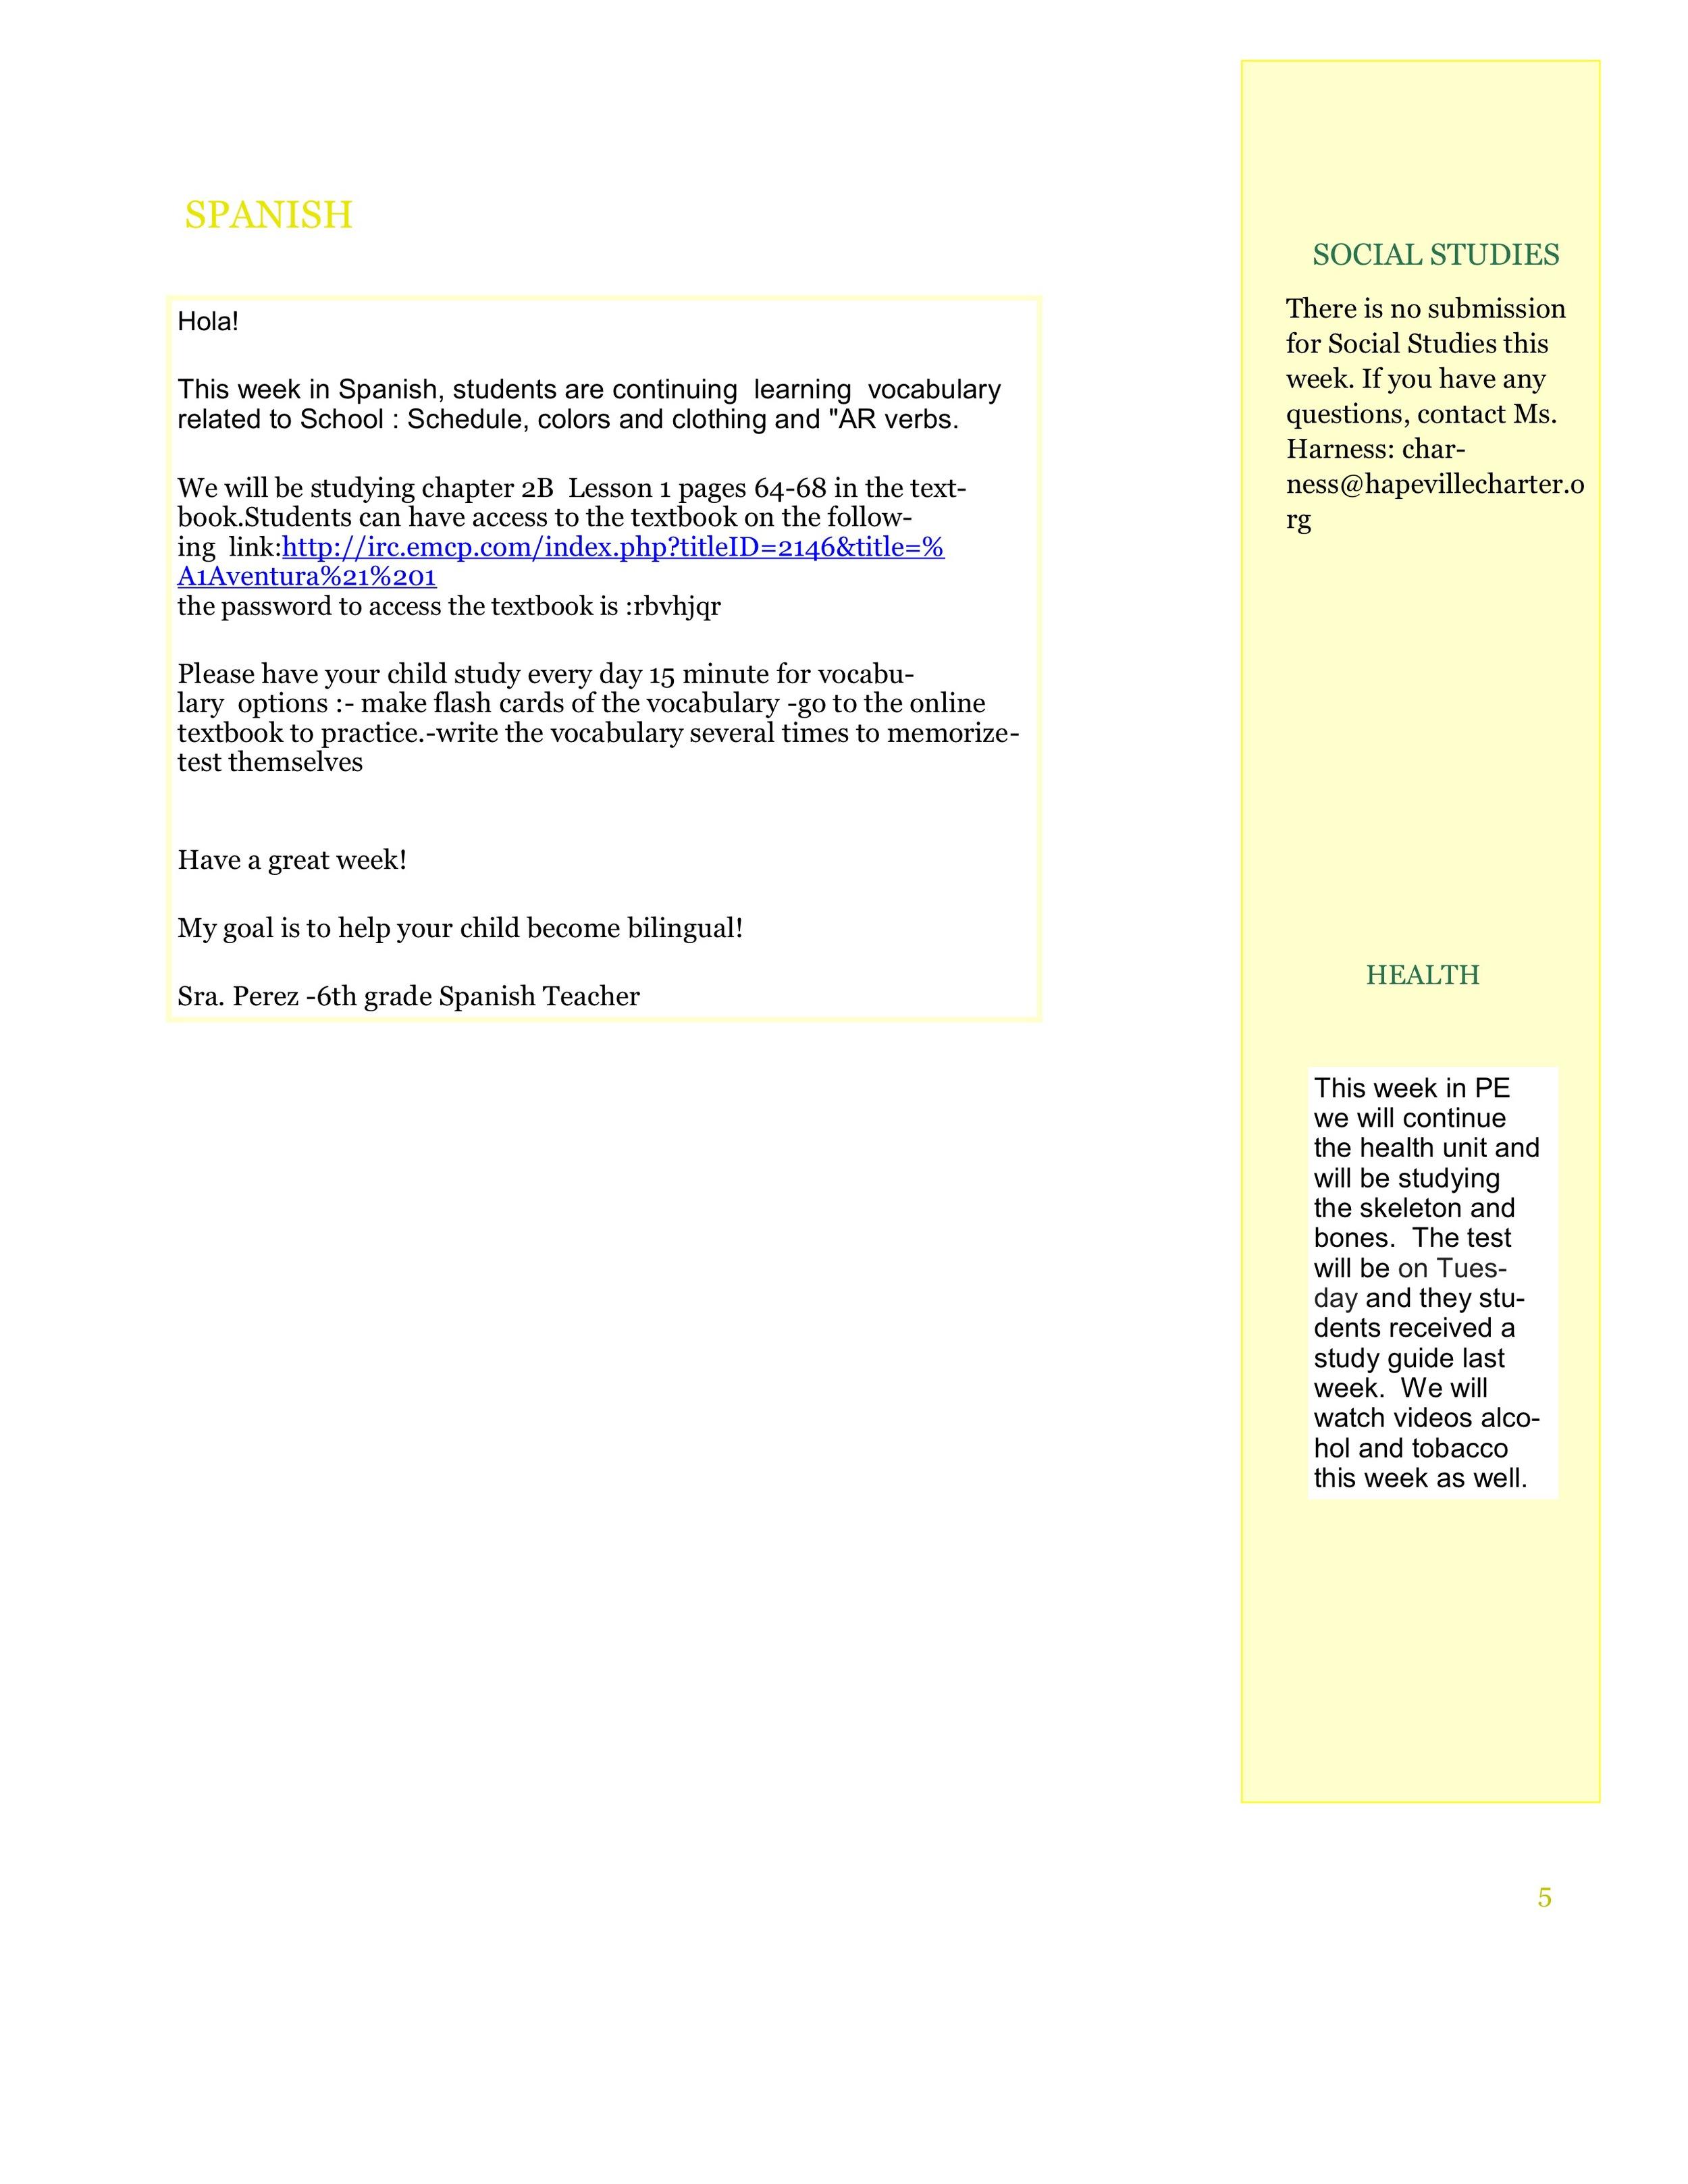 Newsletter ImageFebruary 9-13 5.jpeg